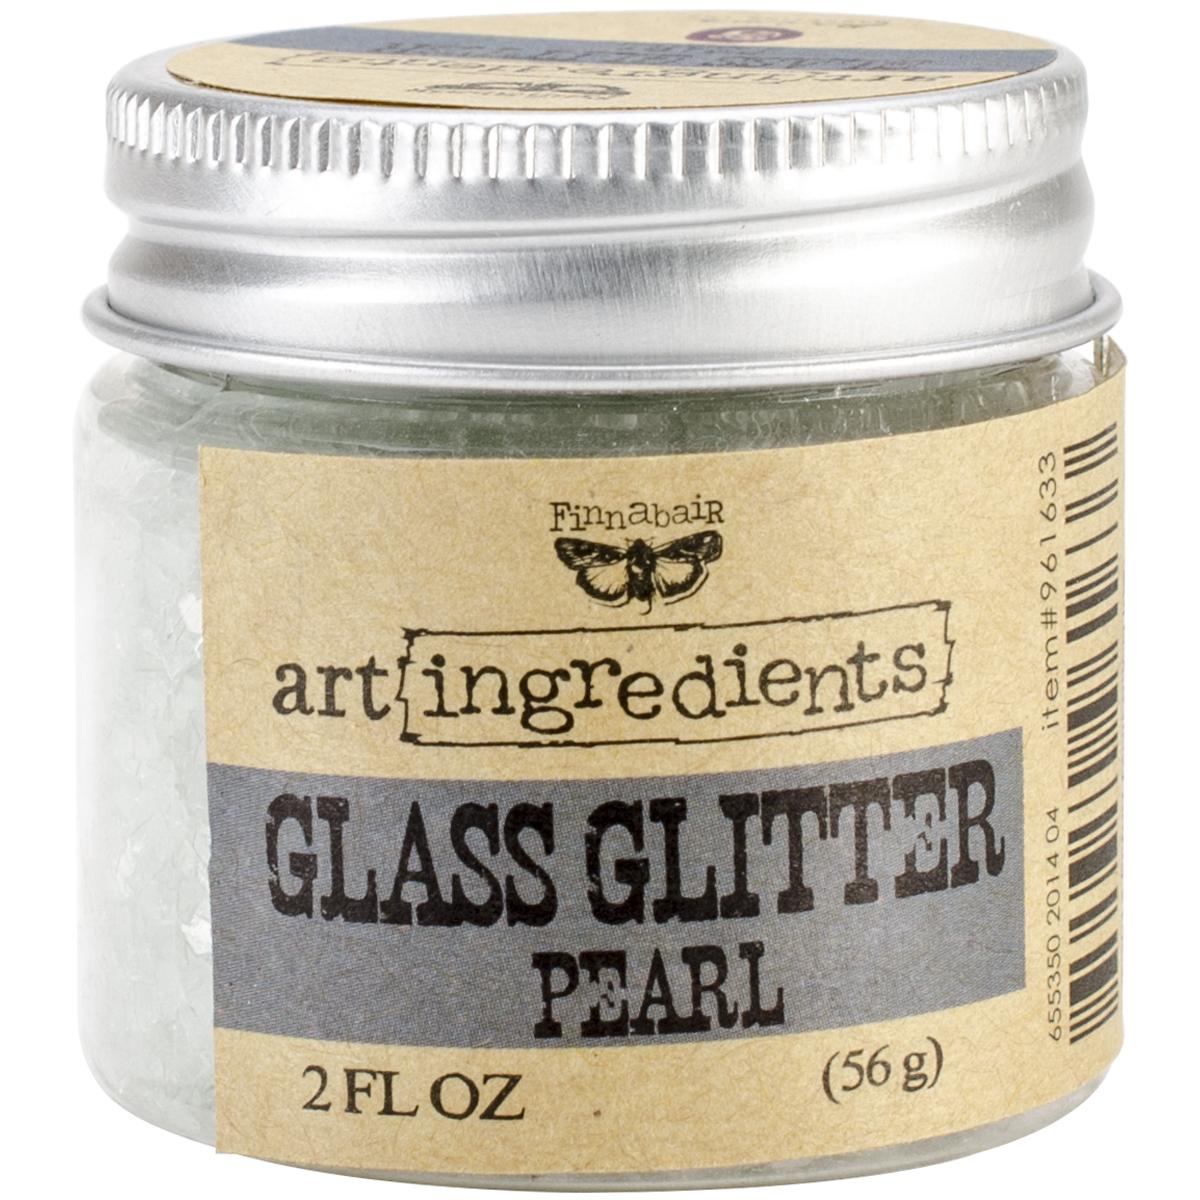 Finnabair Art Ingredients Glass Glitter 2oz-Pearl